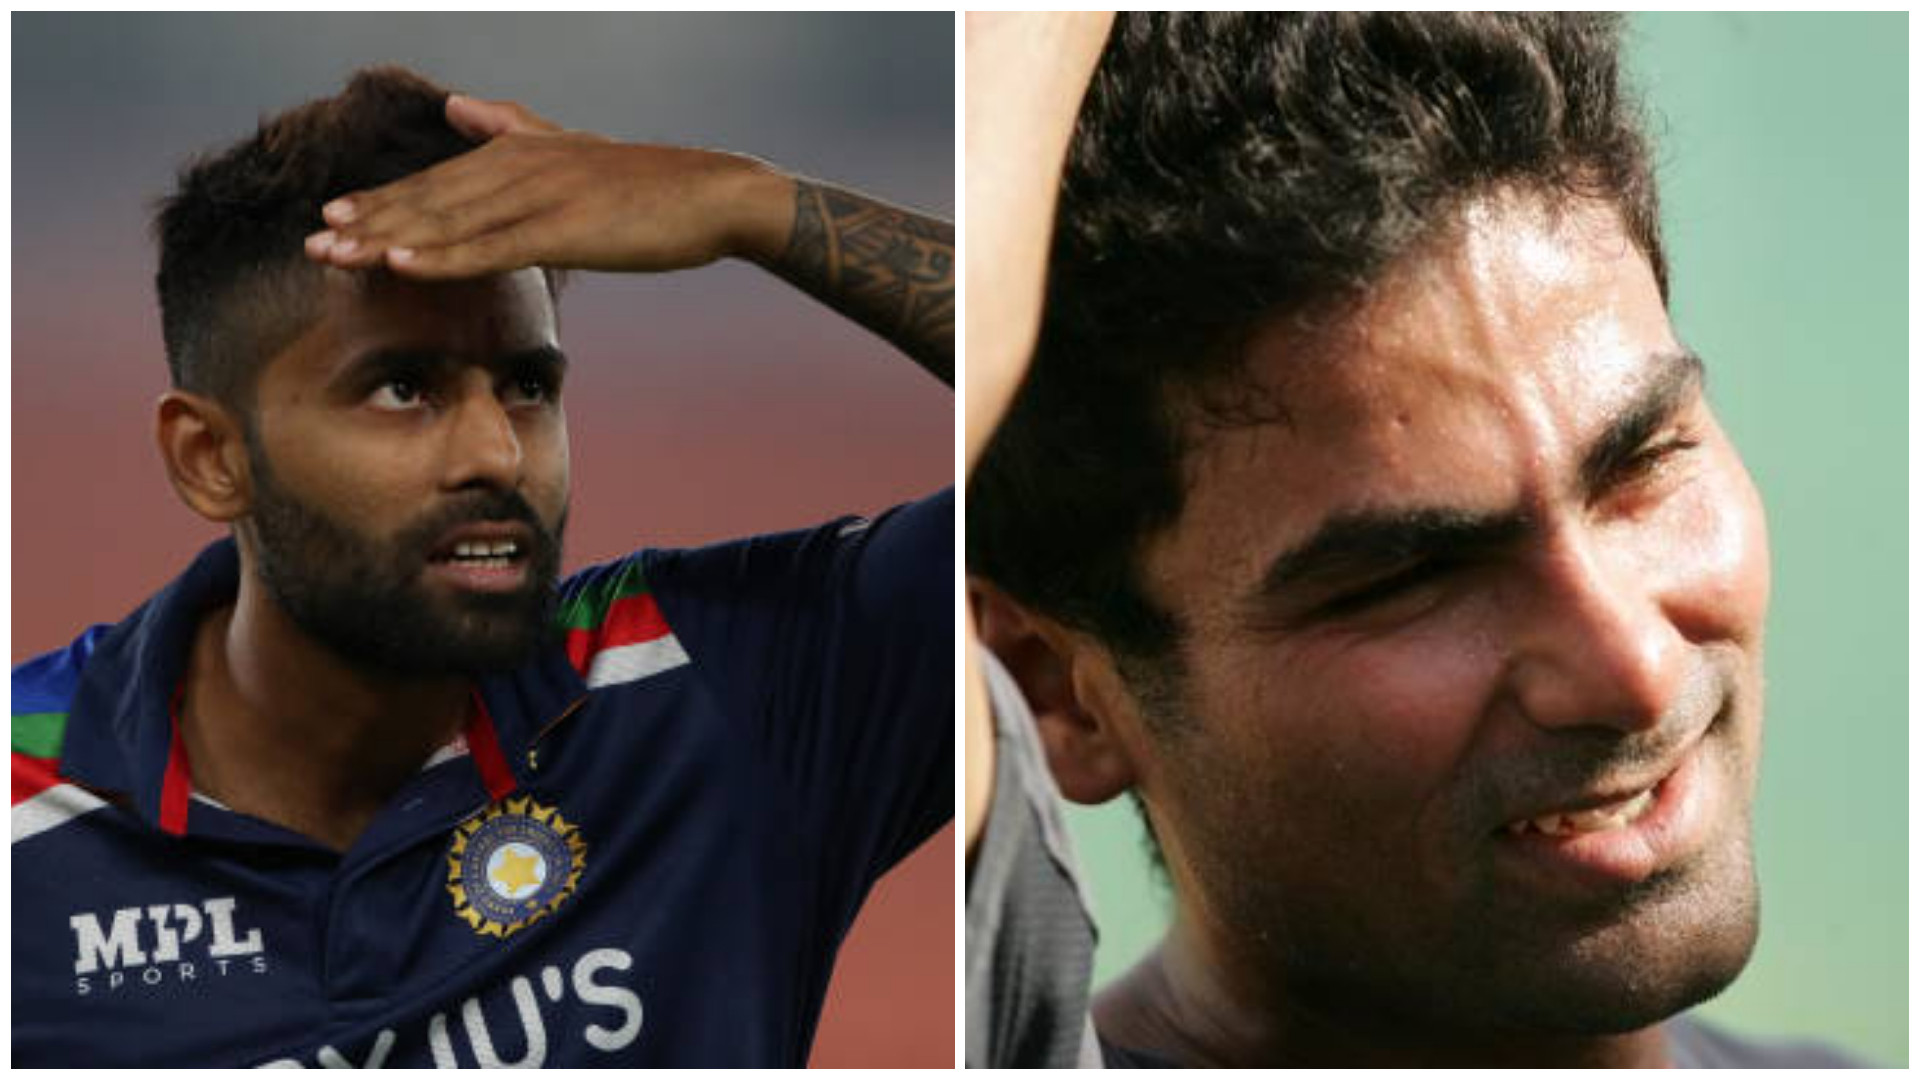 SL v IND 2021: Suryakumar Yadav plays his first ball like he already has a 100, says Kaif